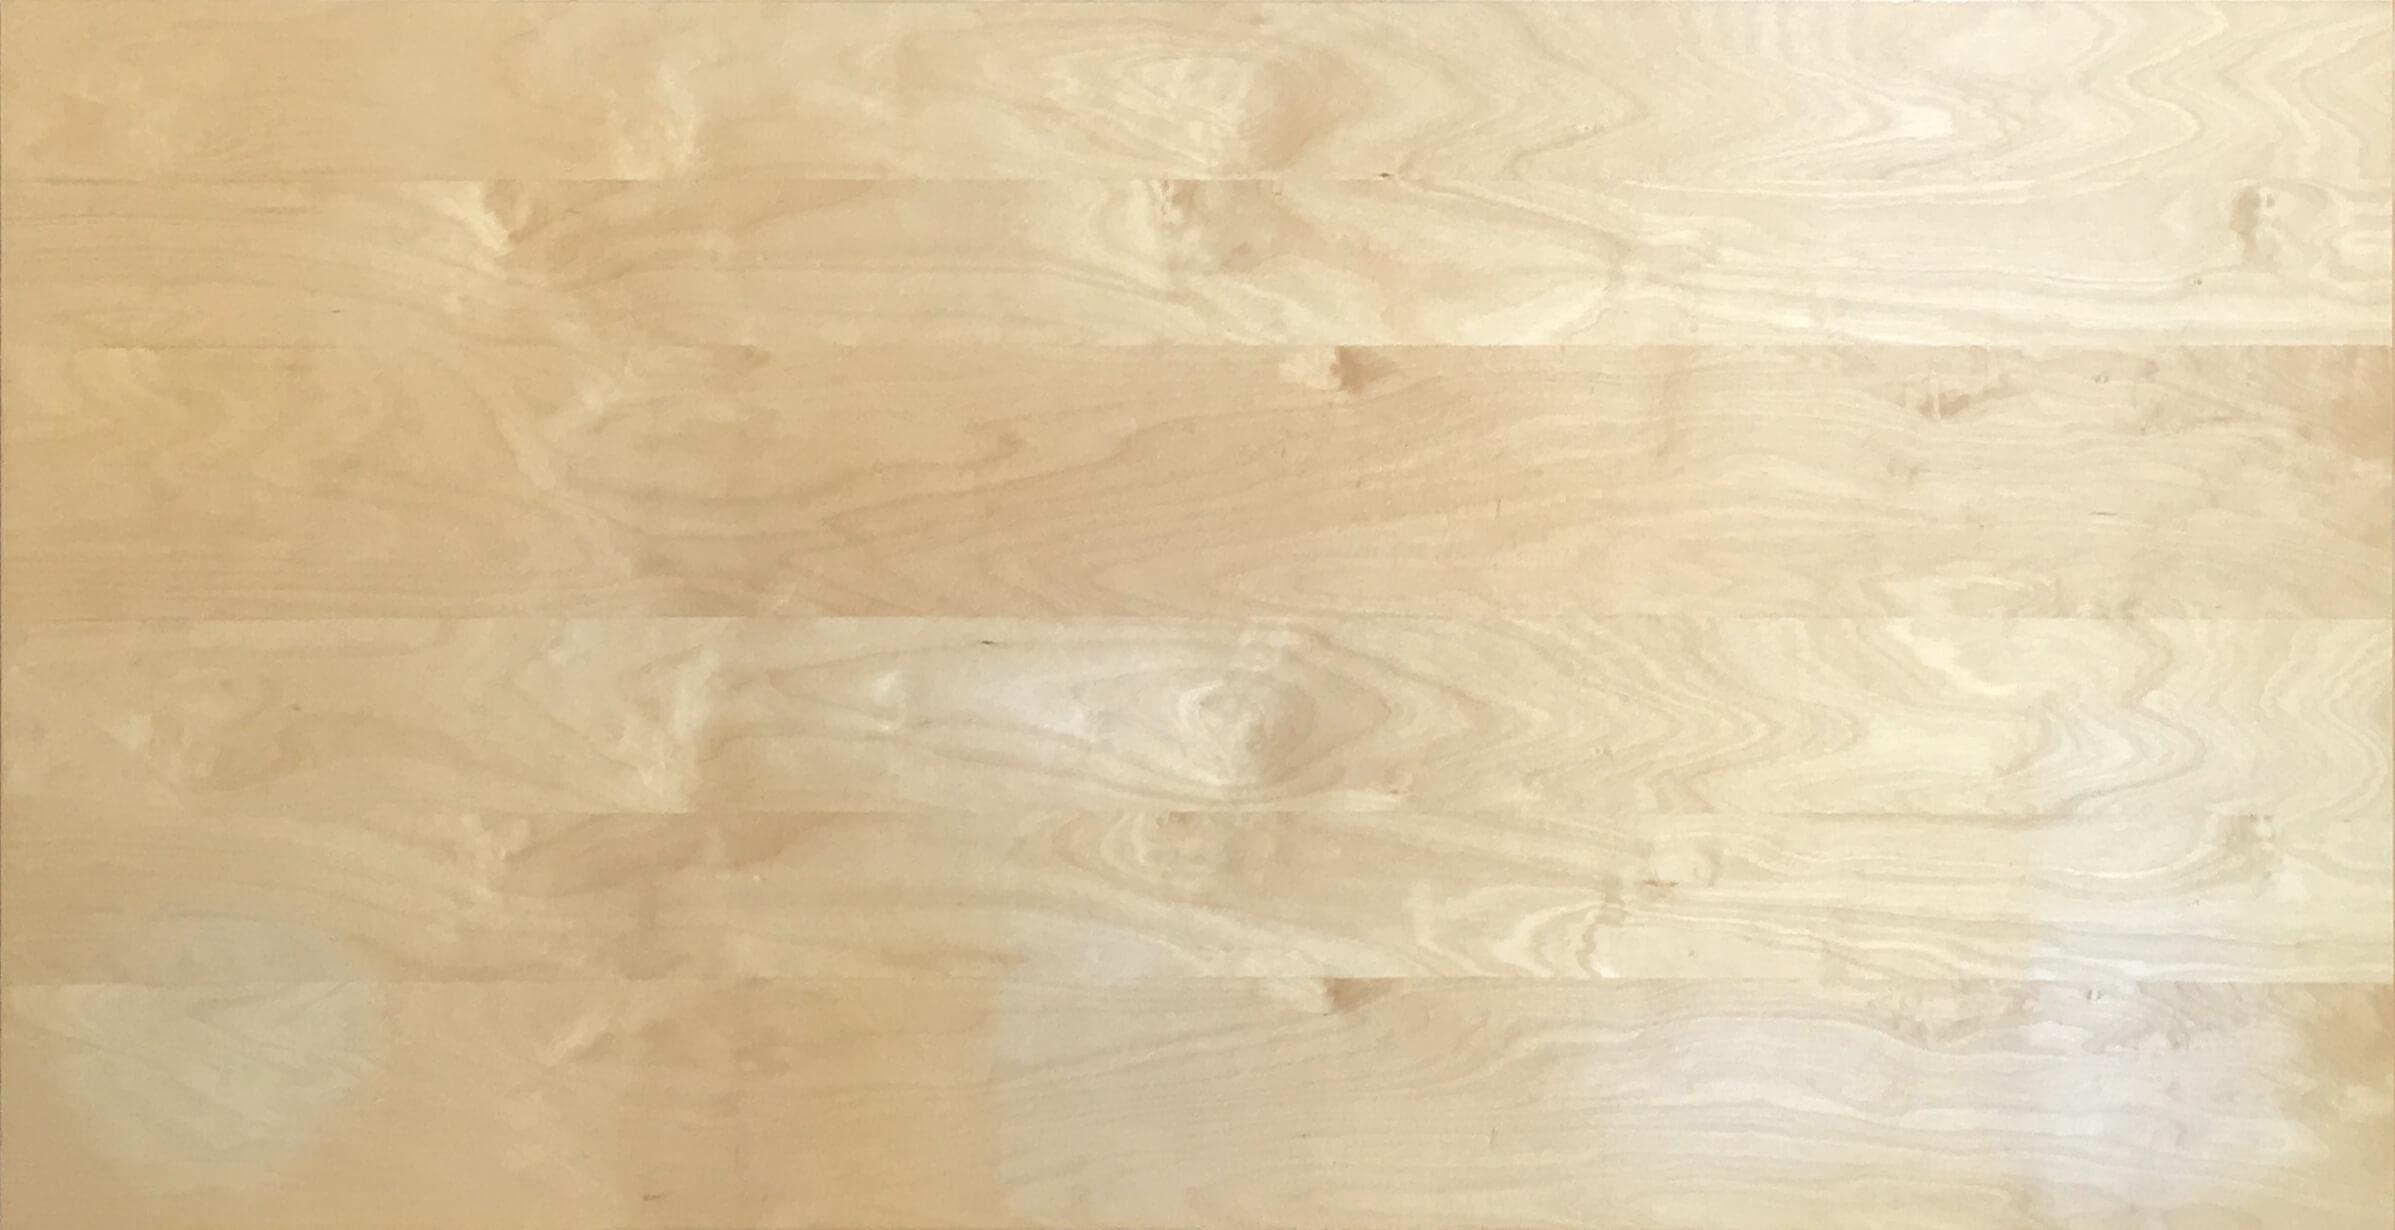 Tischplatte ikea grau  IKEA Galant Tischplatte Birke 160x80cm 100.568.50-10056850